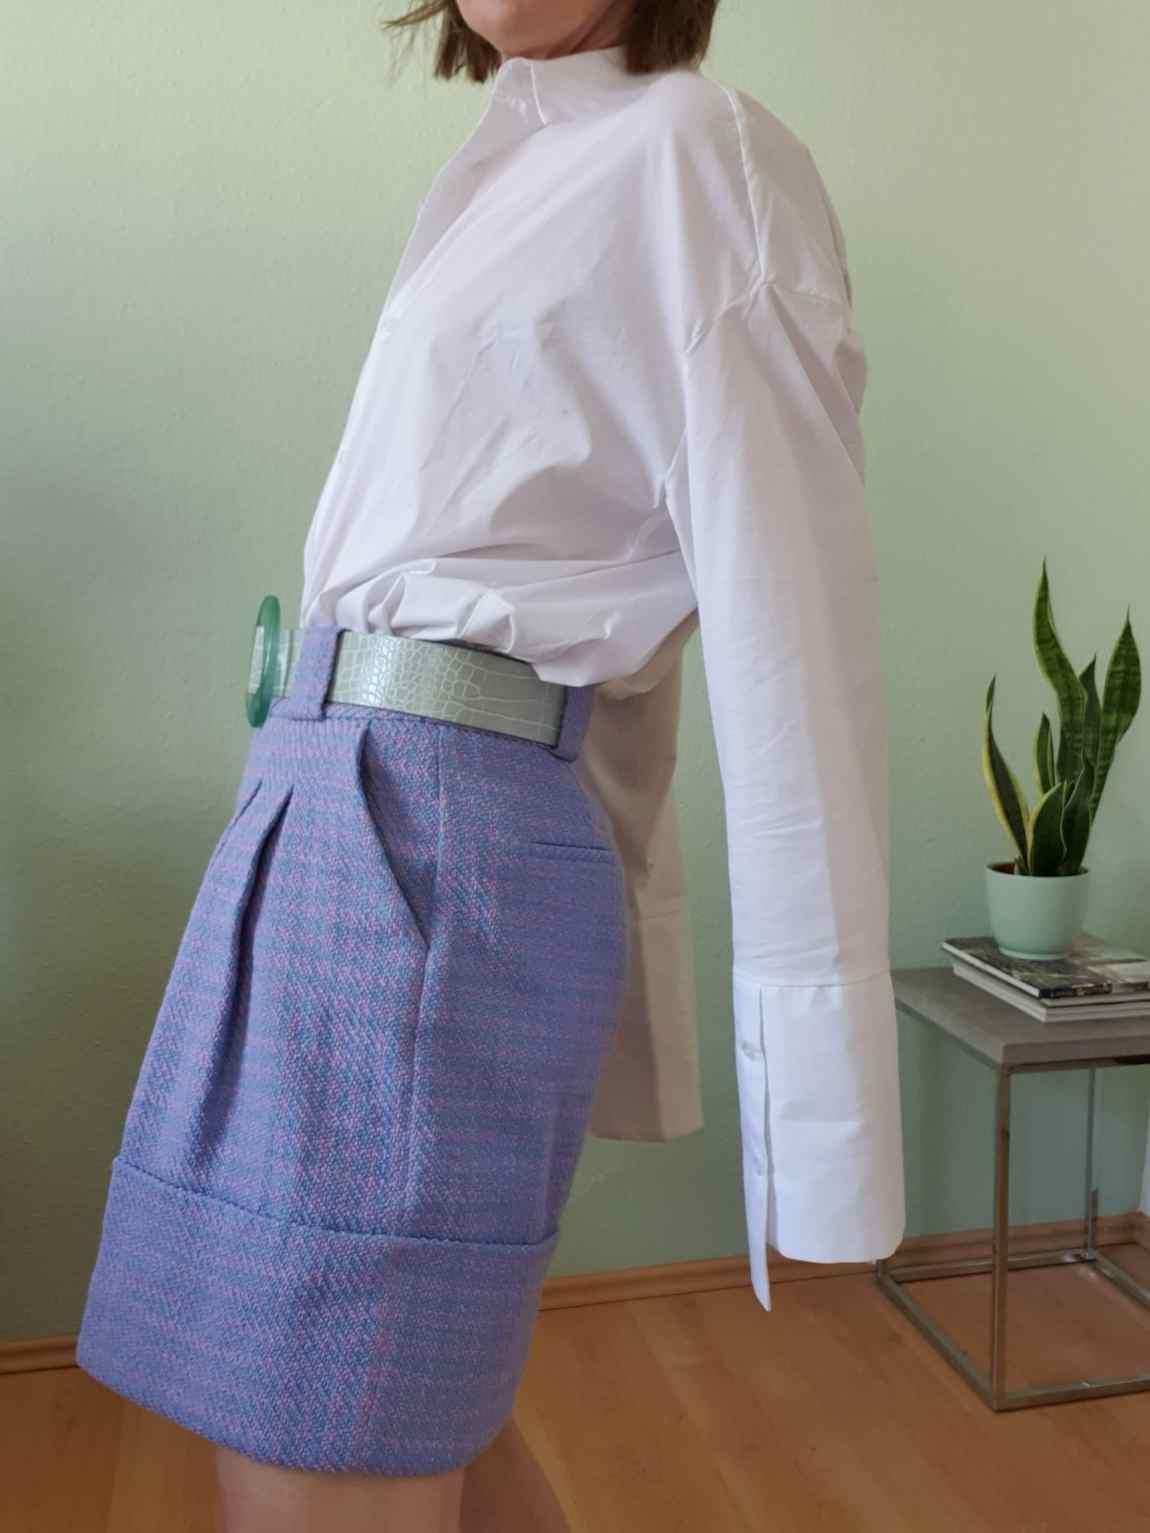 modeblog-ue40-shorts-damen-tweed-uterque-mode-blog-ue50-oceanblue-style.jpg (3)